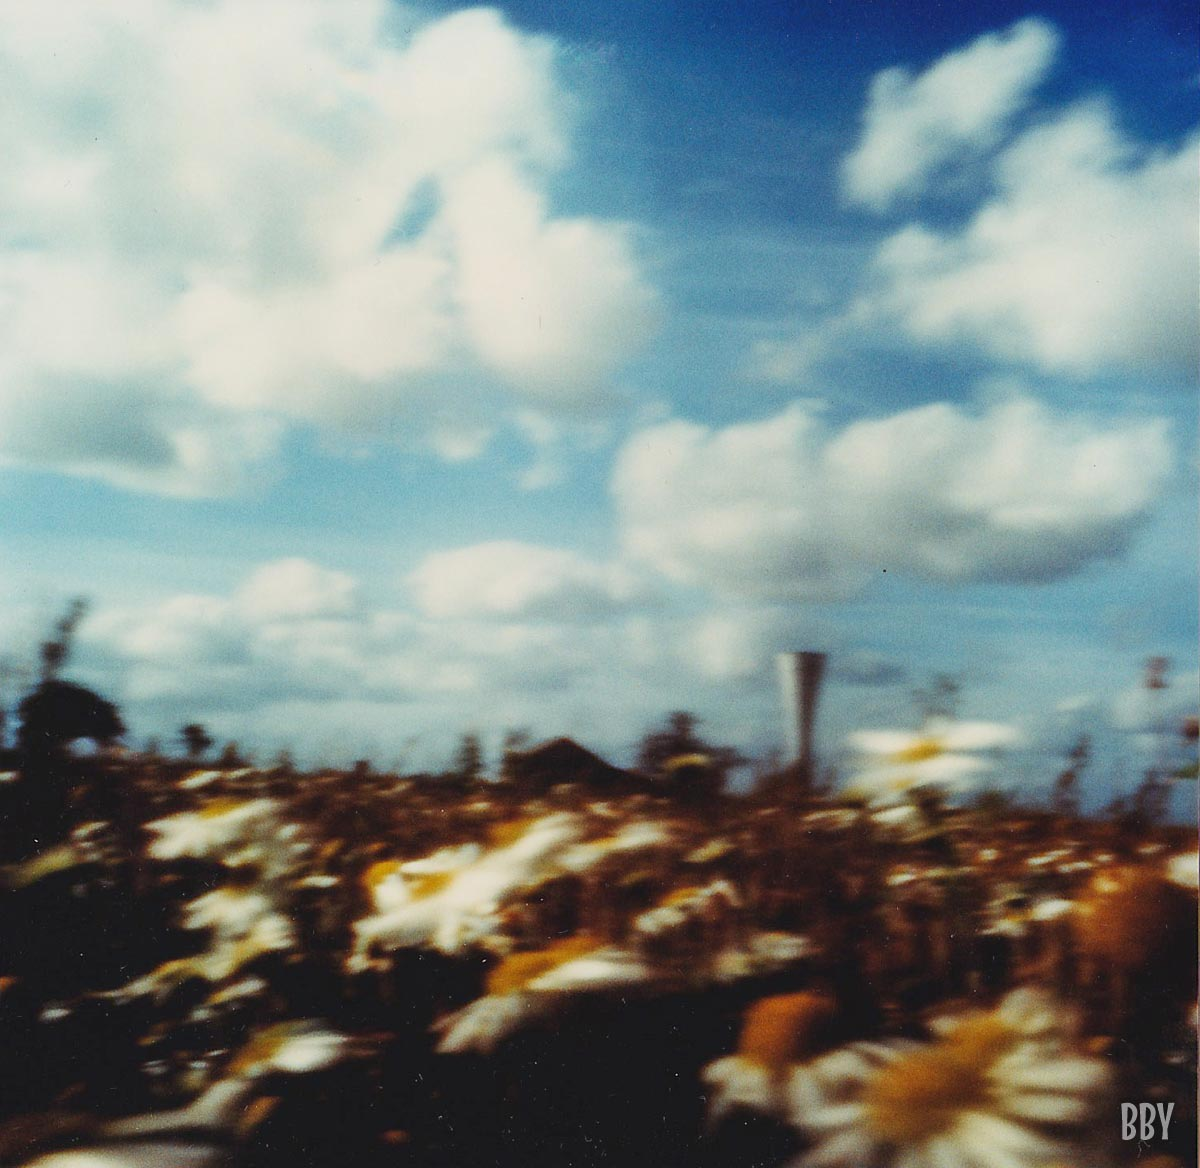 stenope, pinhole, slow photography, chambre noire, margueritte